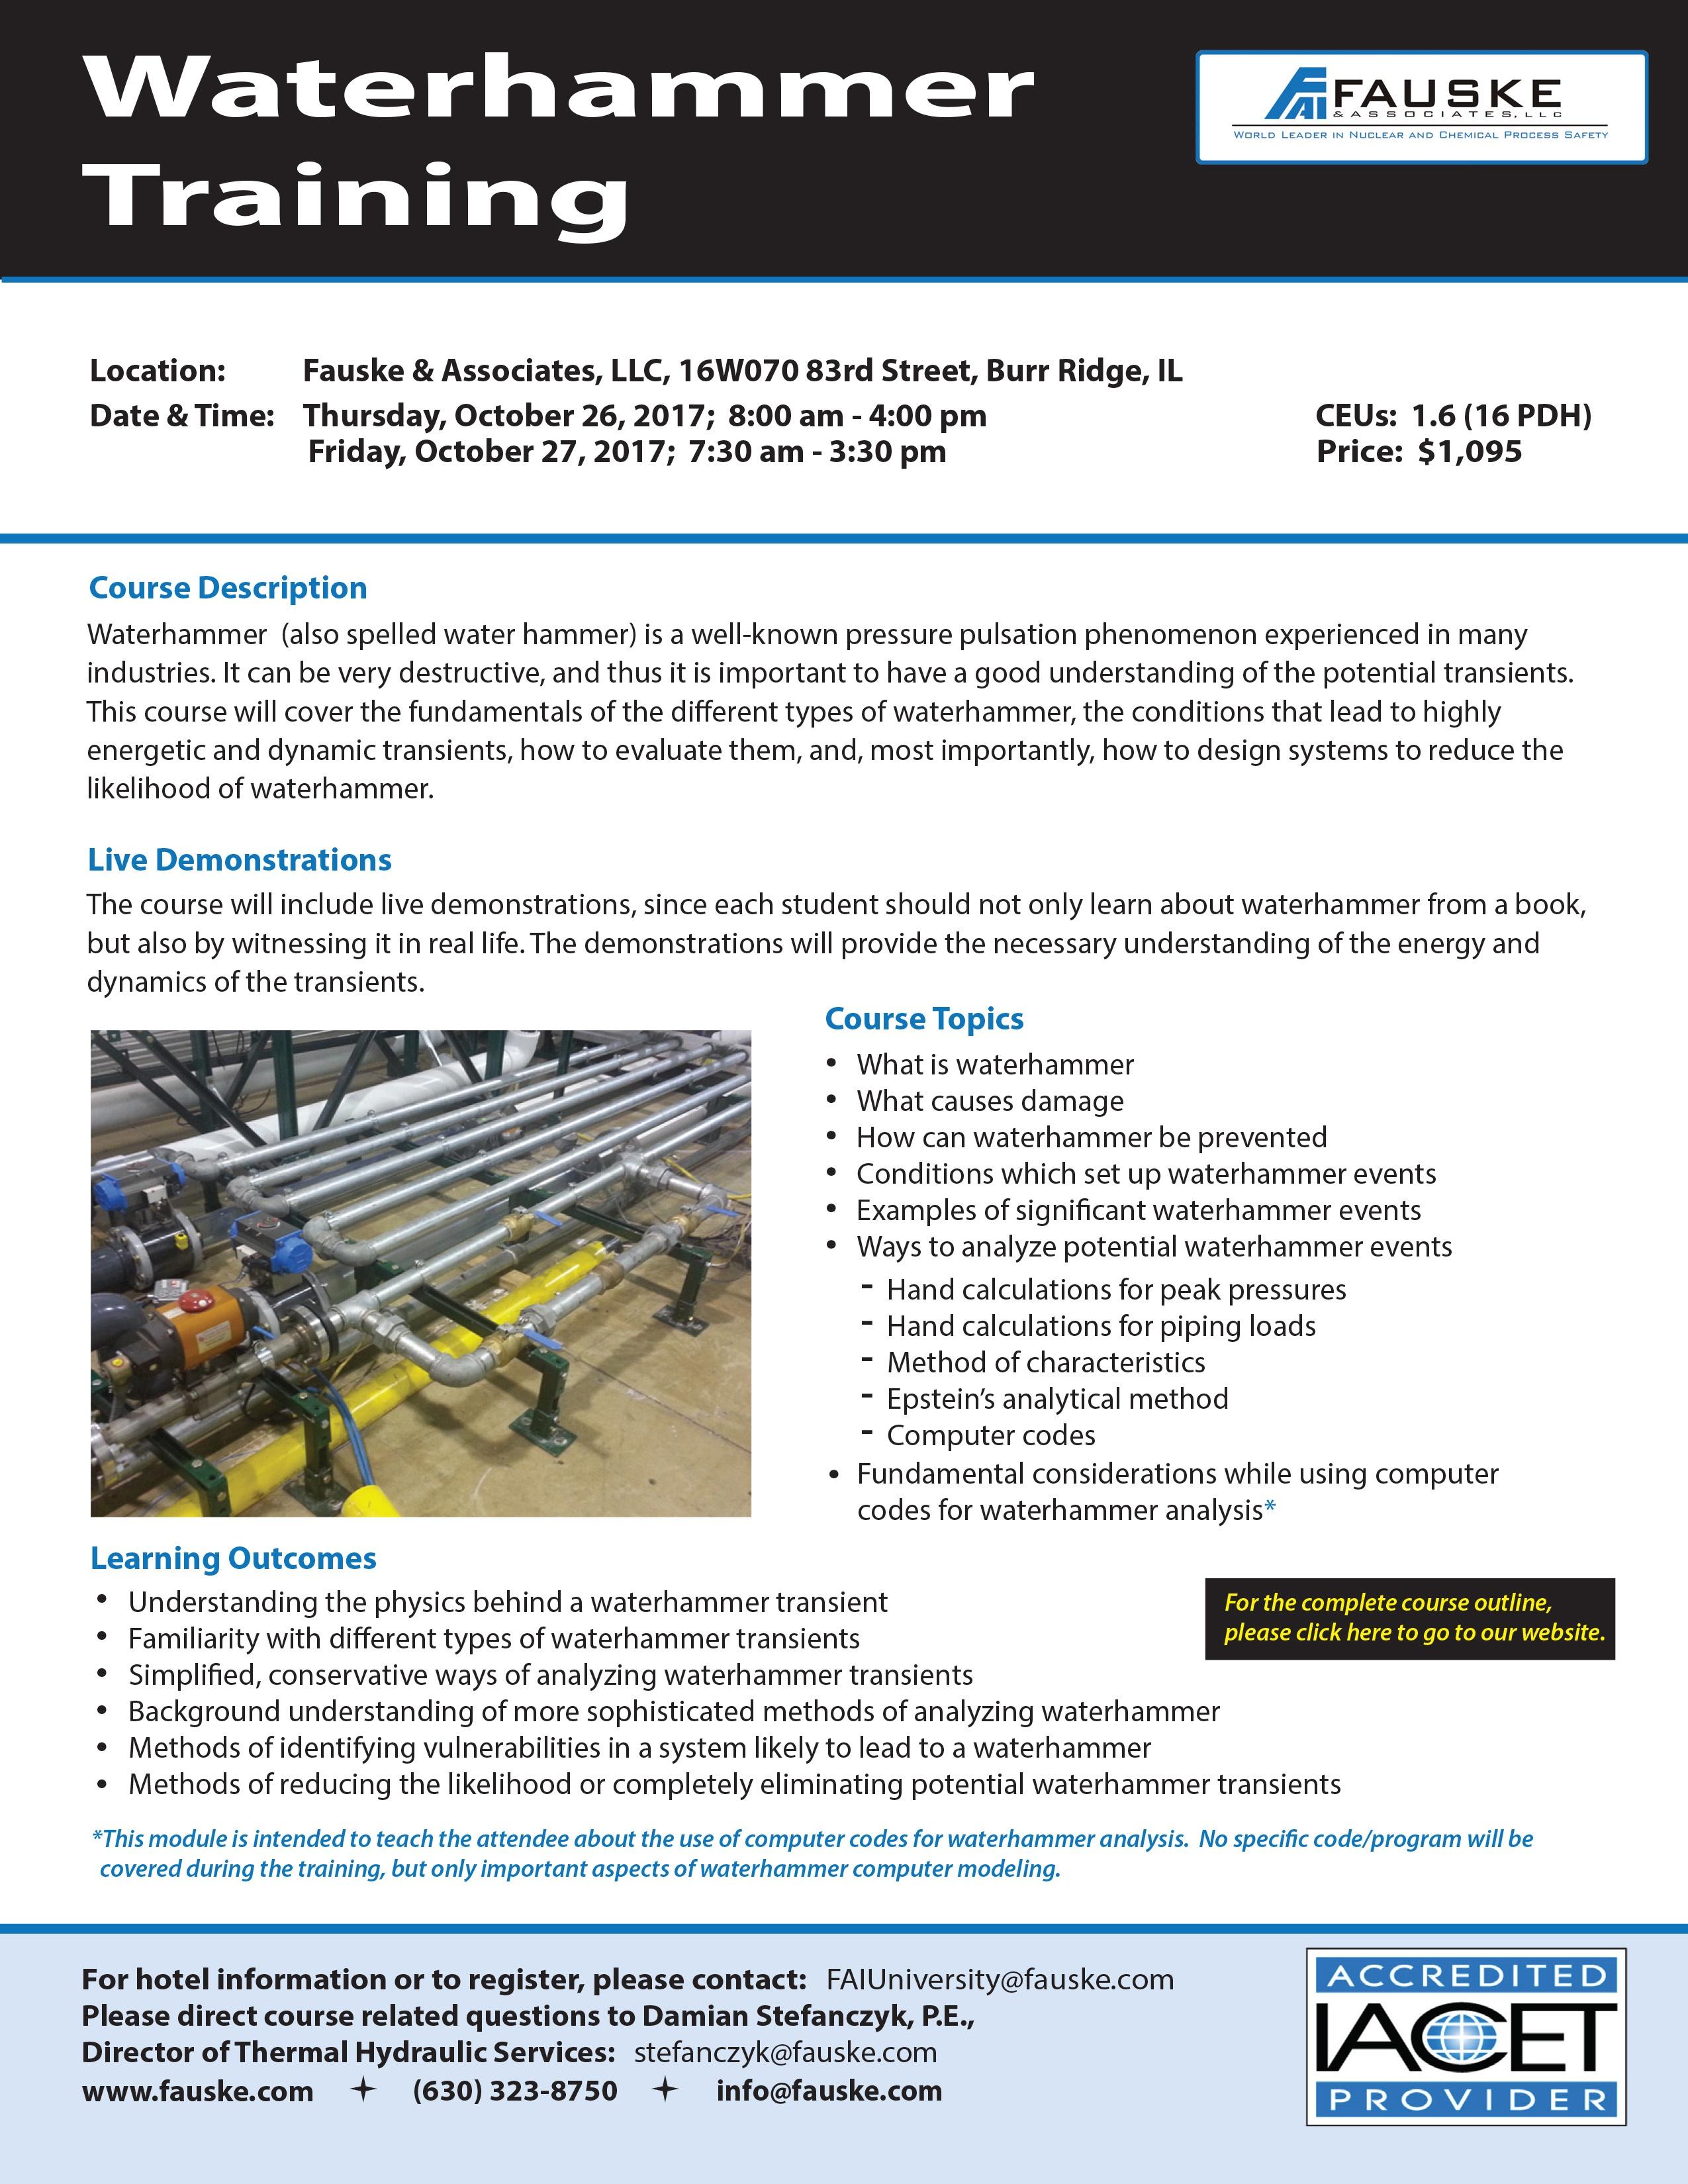 Waterhammer Training Course